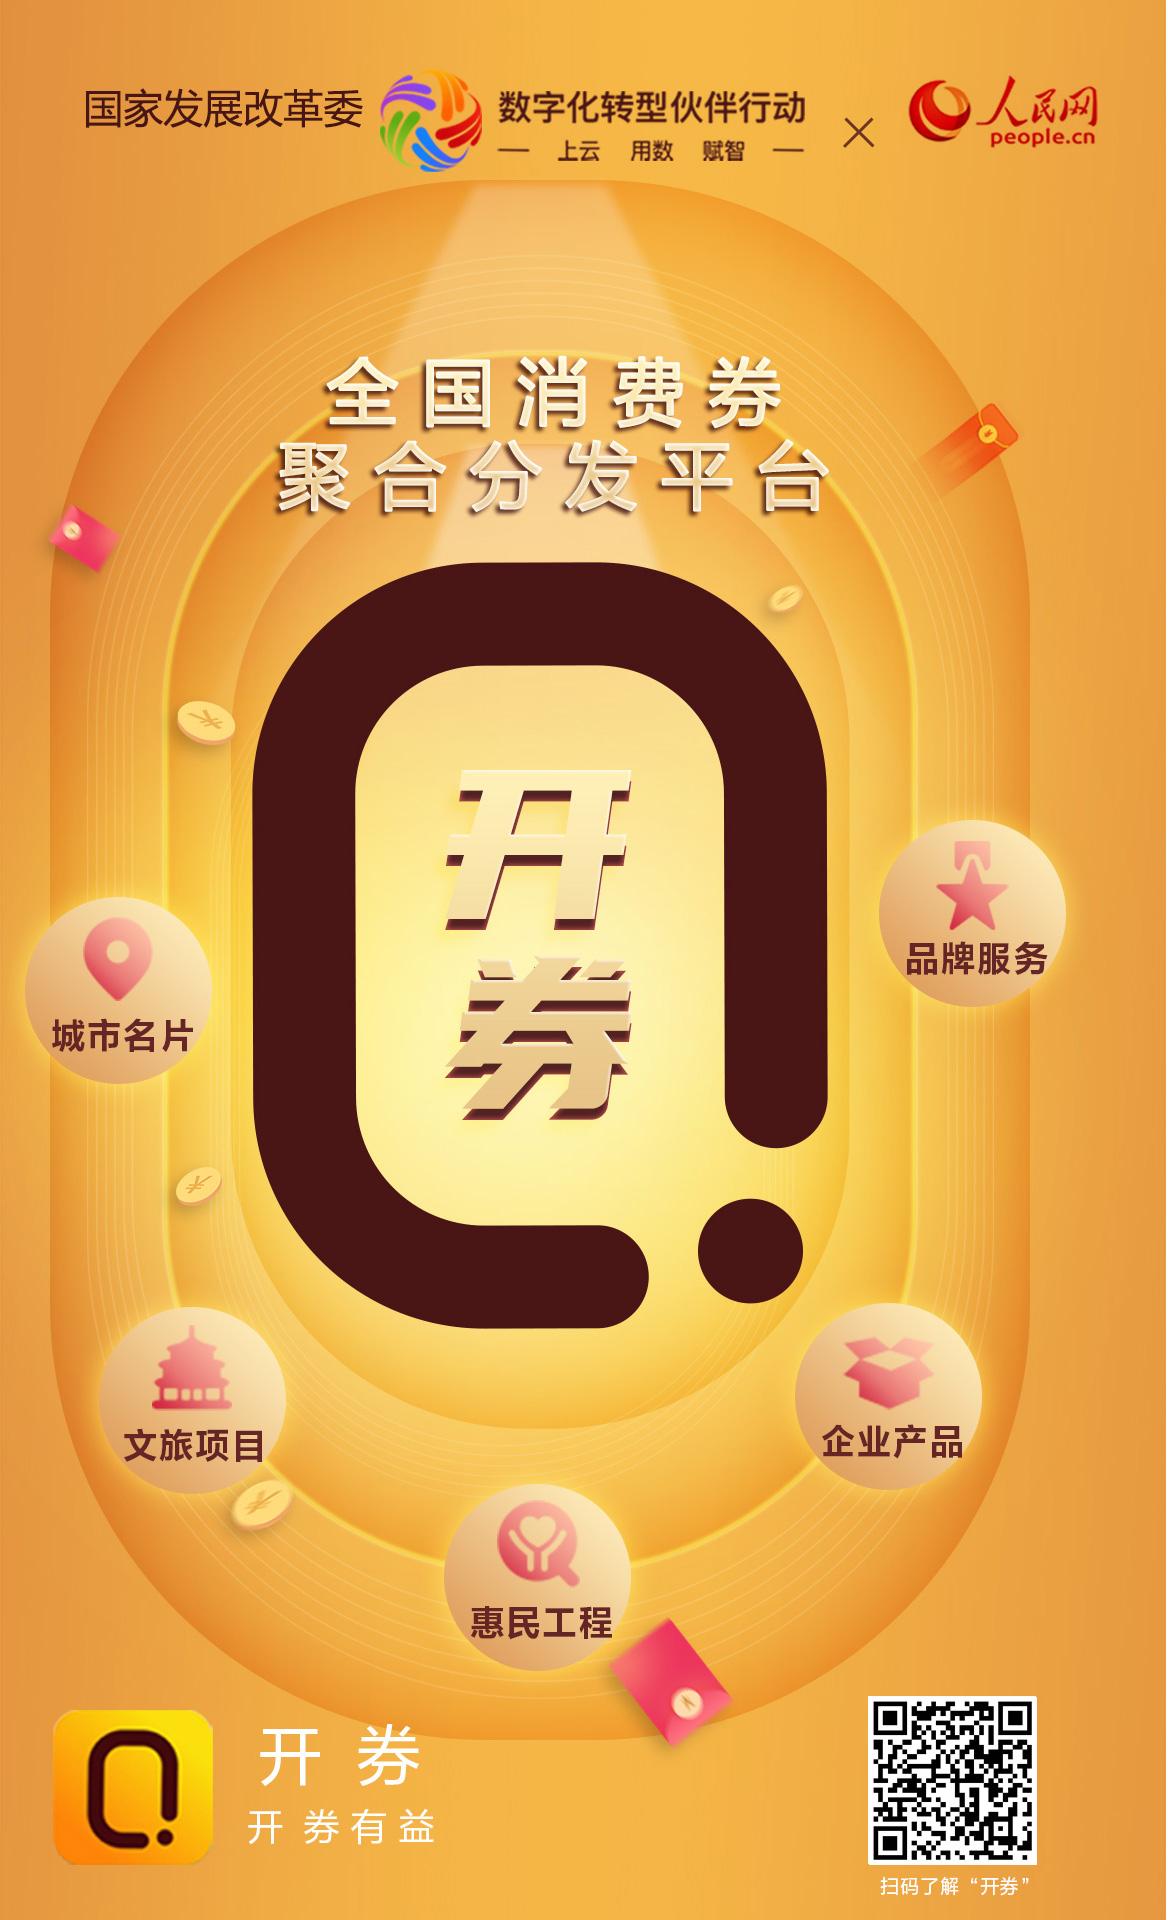 http://news.xhby.net/tuijian/202005/W020200519735100892200.jpg